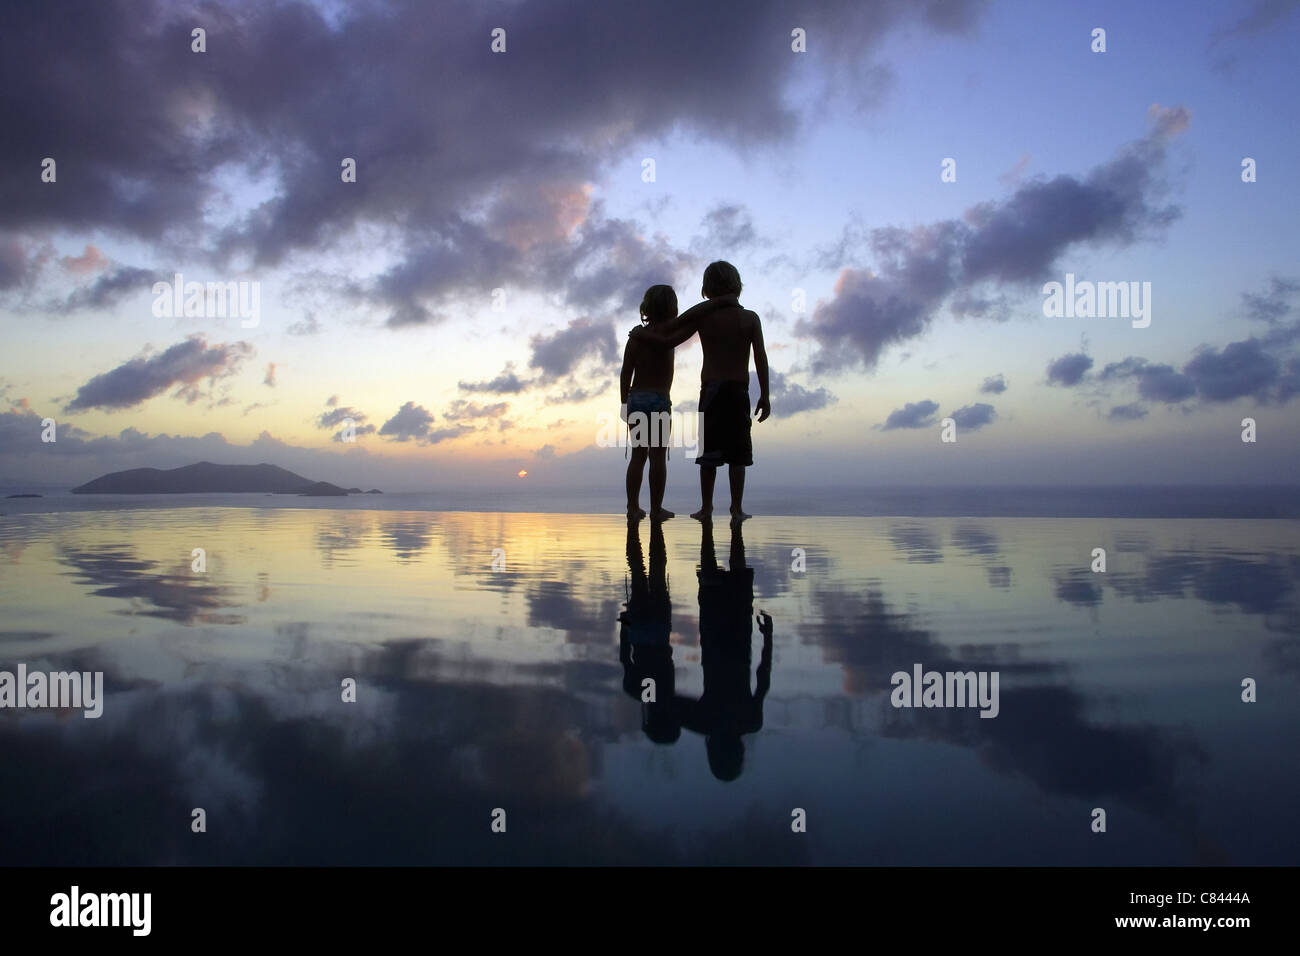 Kinder stehen am Strand bei Sonnenuntergang Stockbild